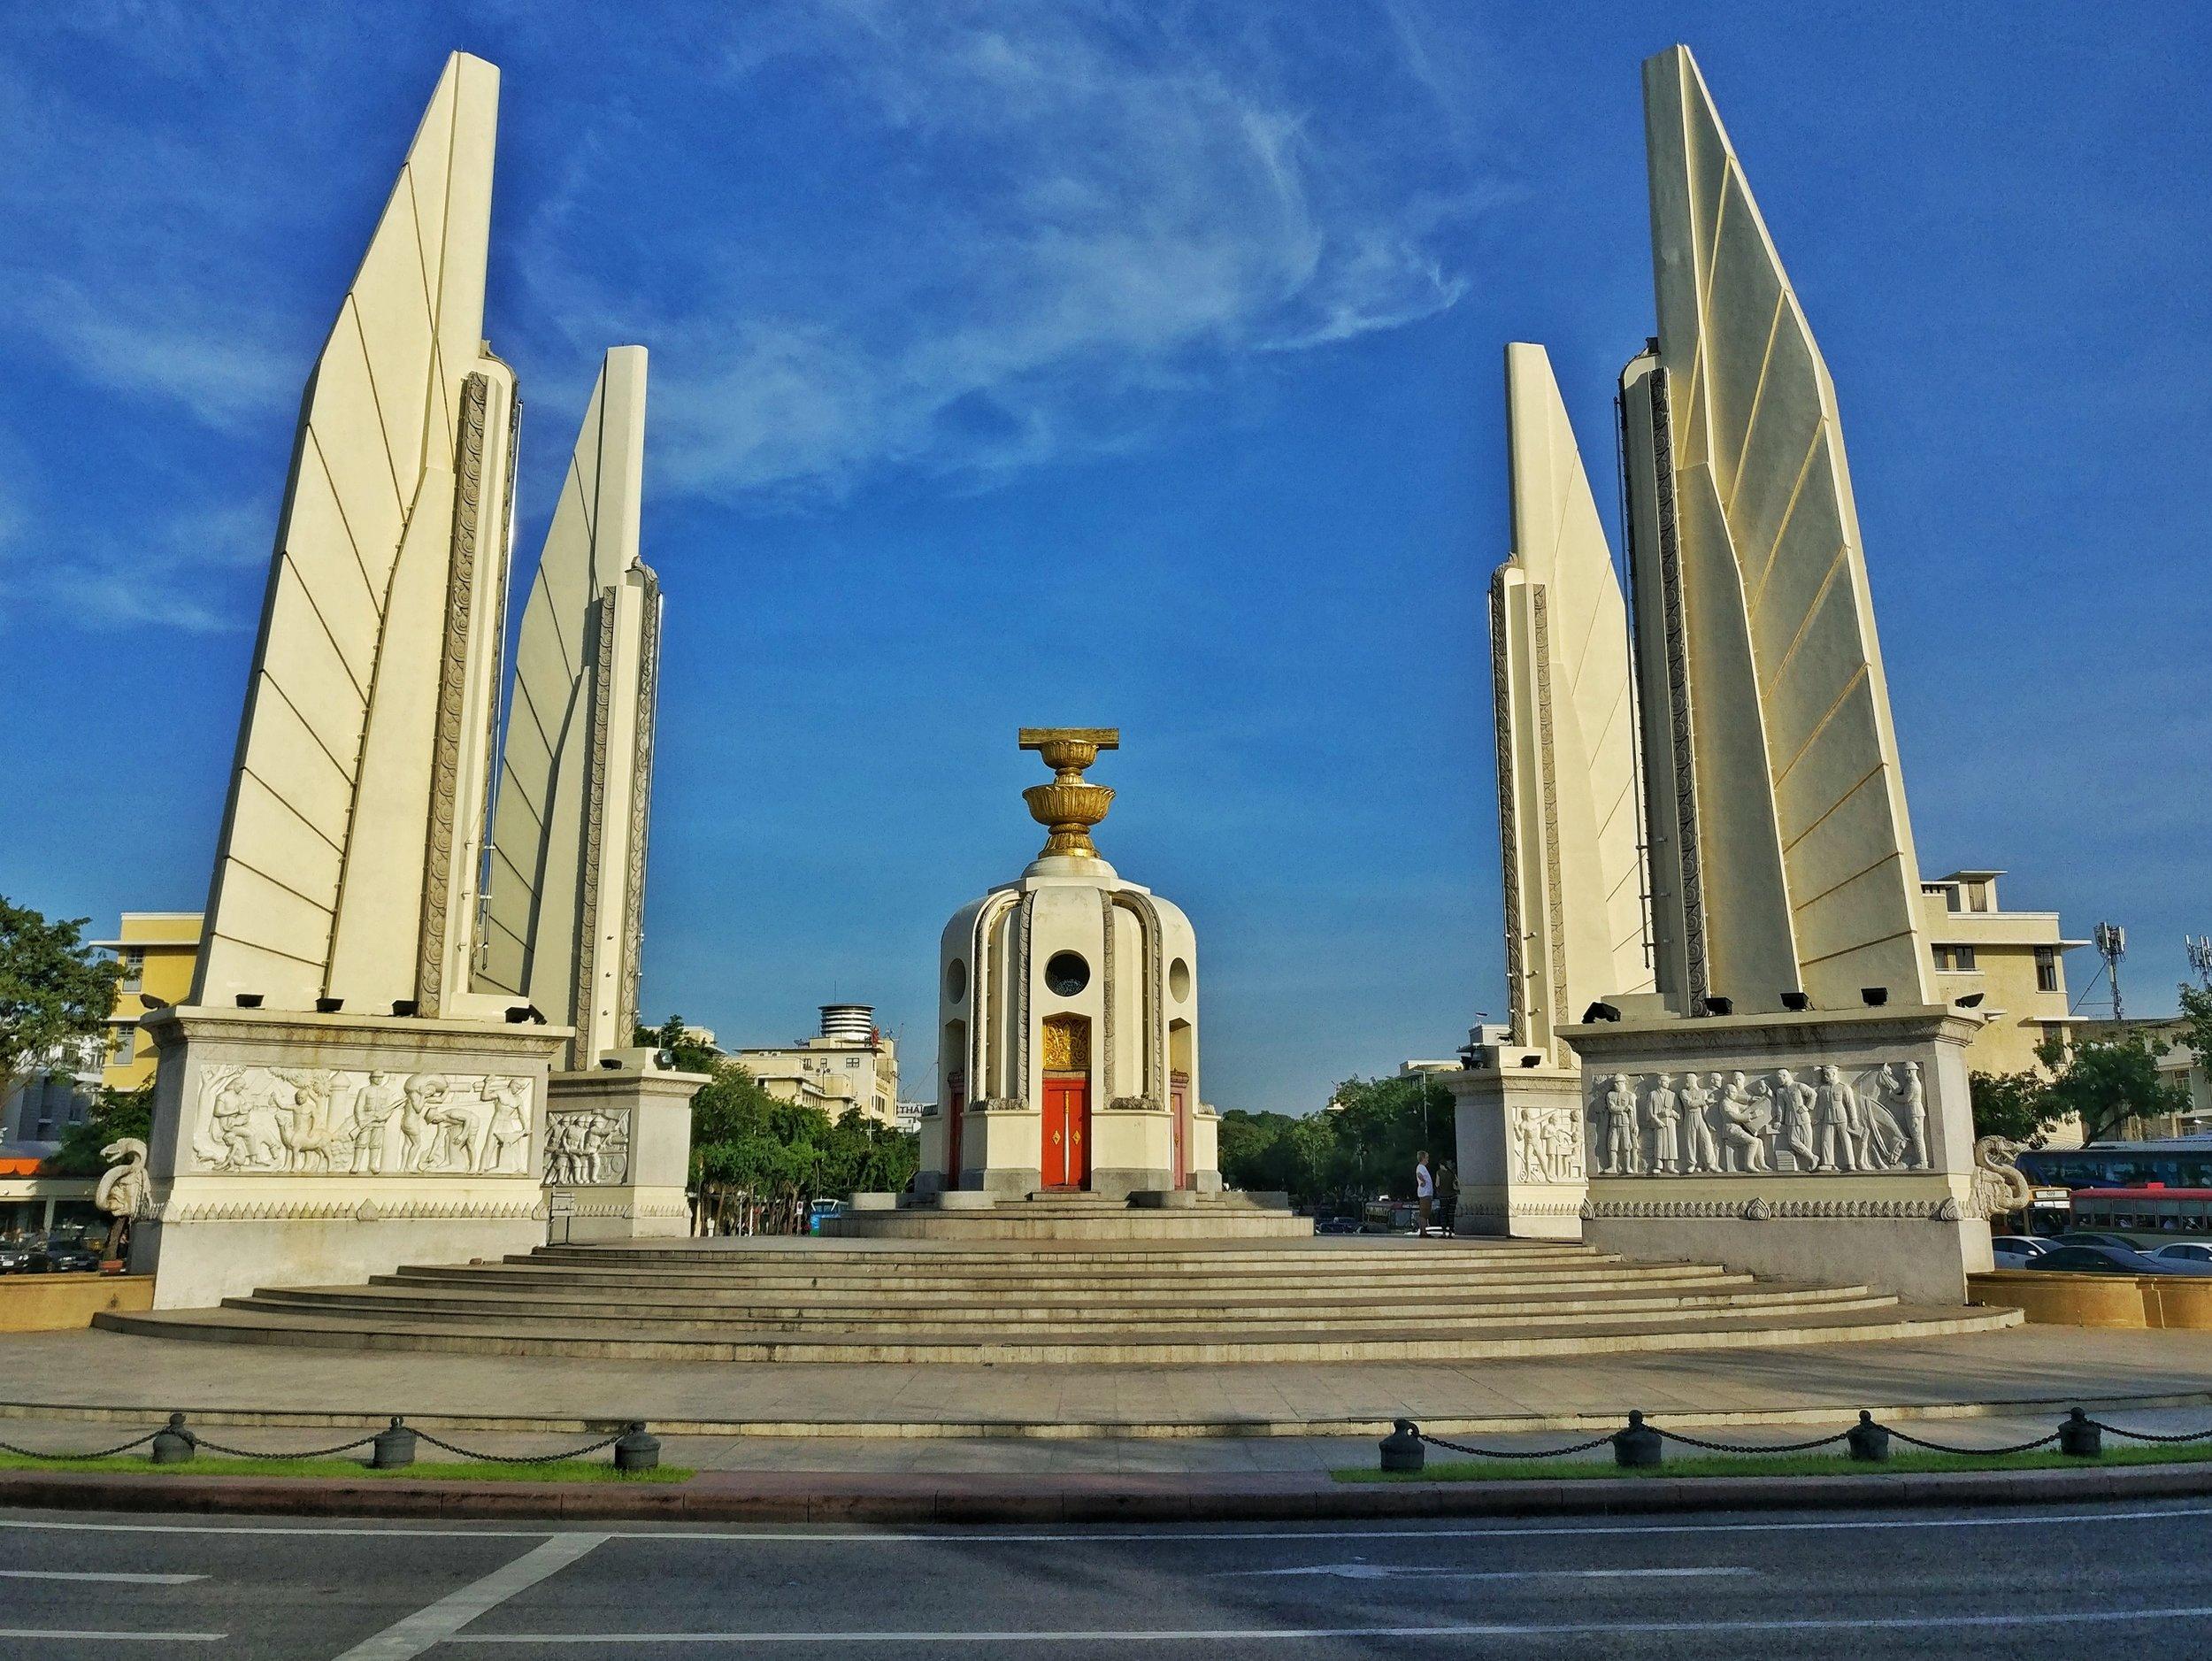 Democracy Monument in city centre